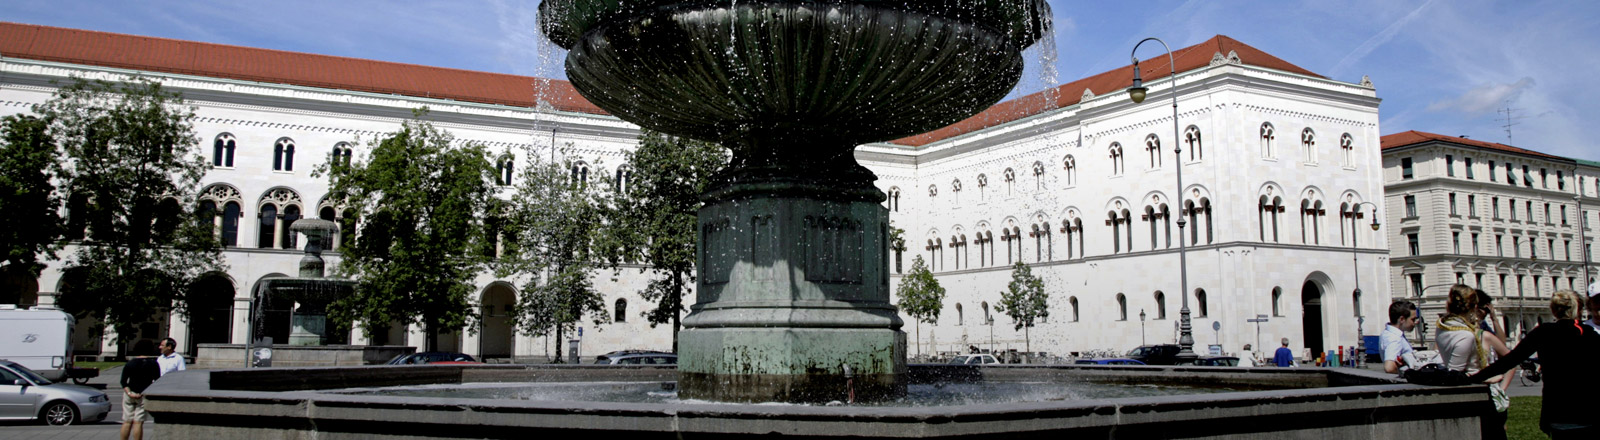 Hauptgebäude der Ludwig-Maximilians-Universität München